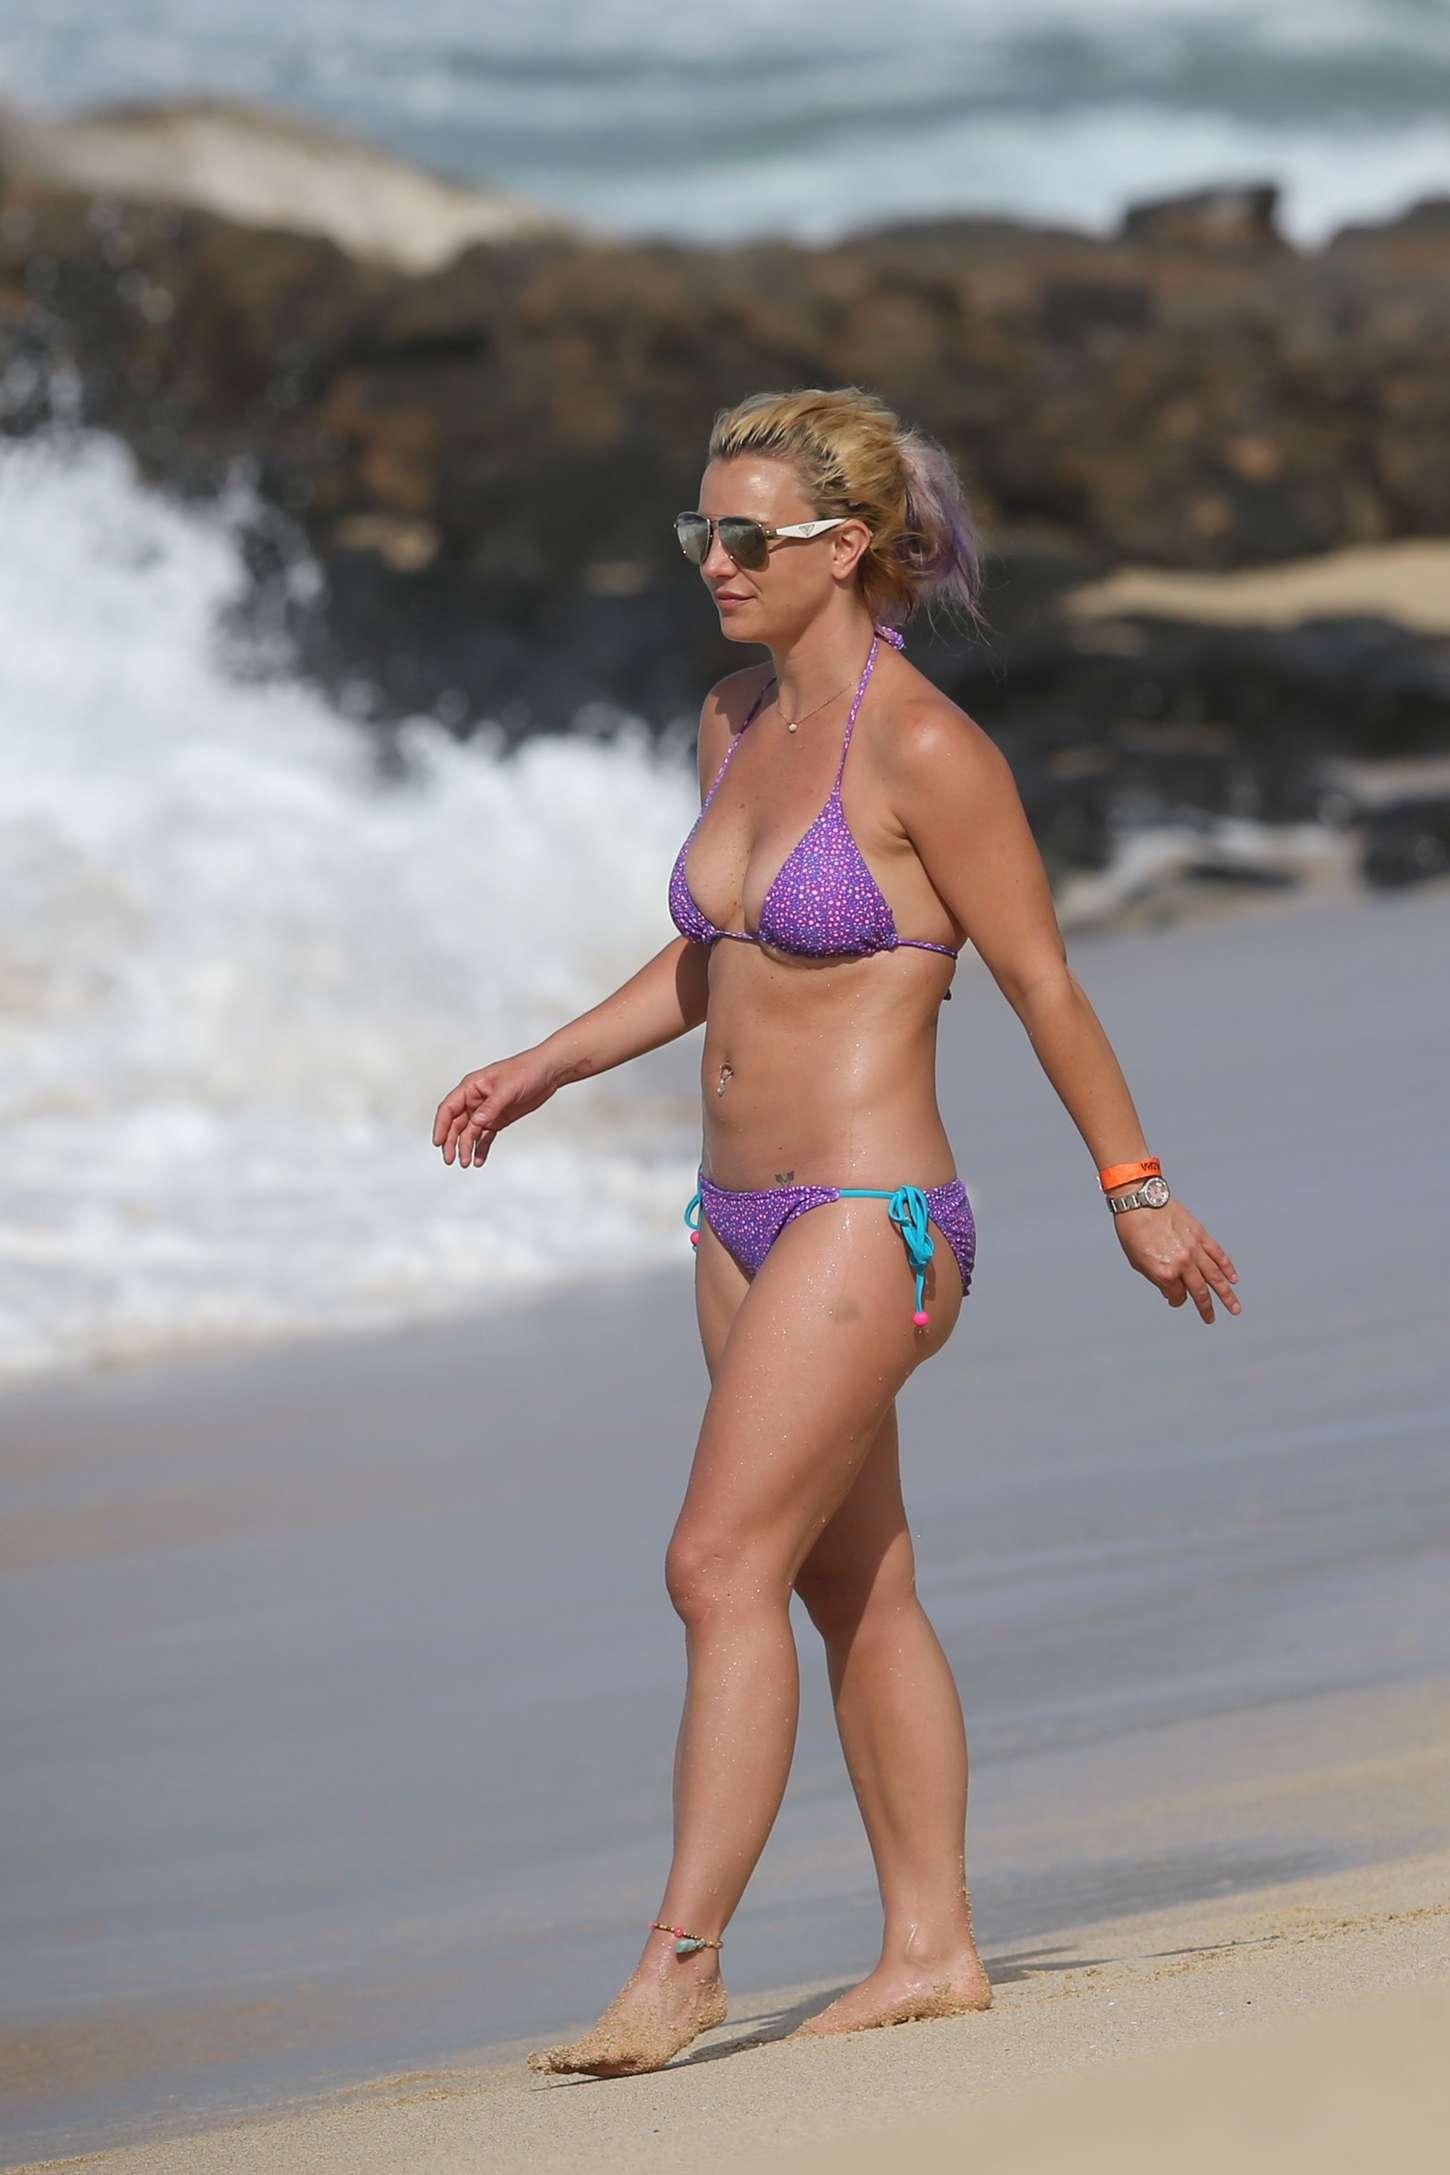 Britney wears a bikini